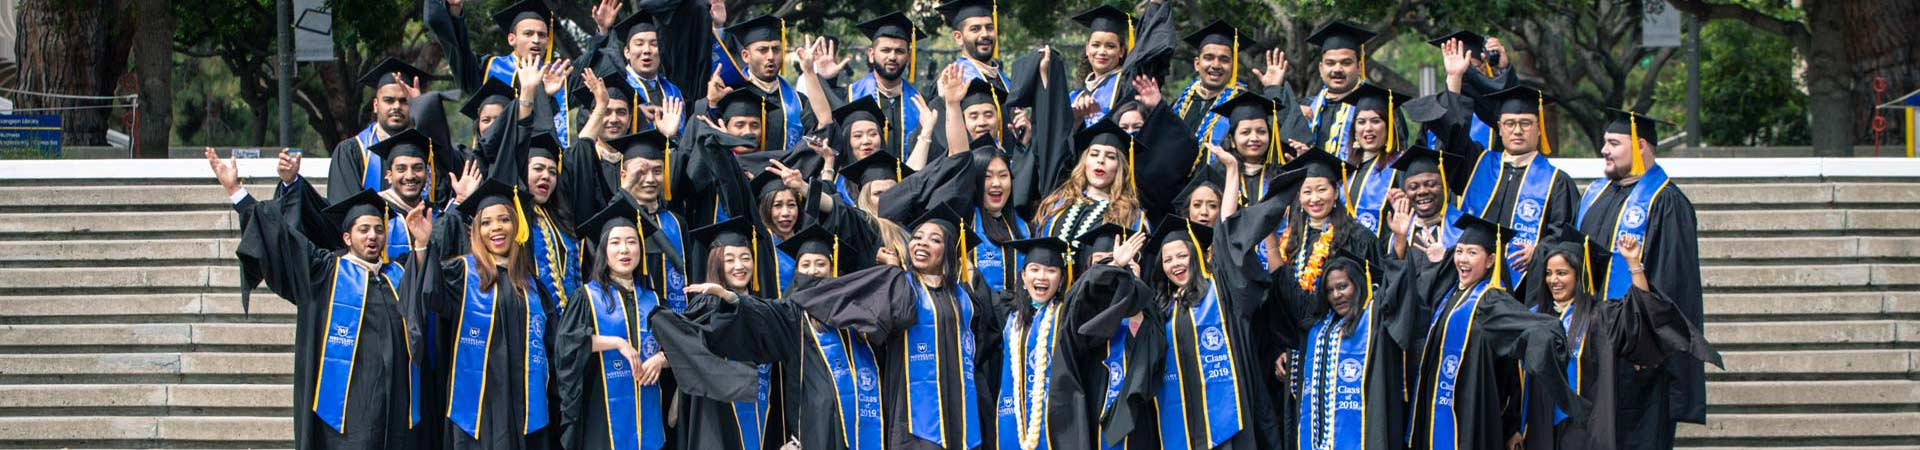 Westcliff Graduates